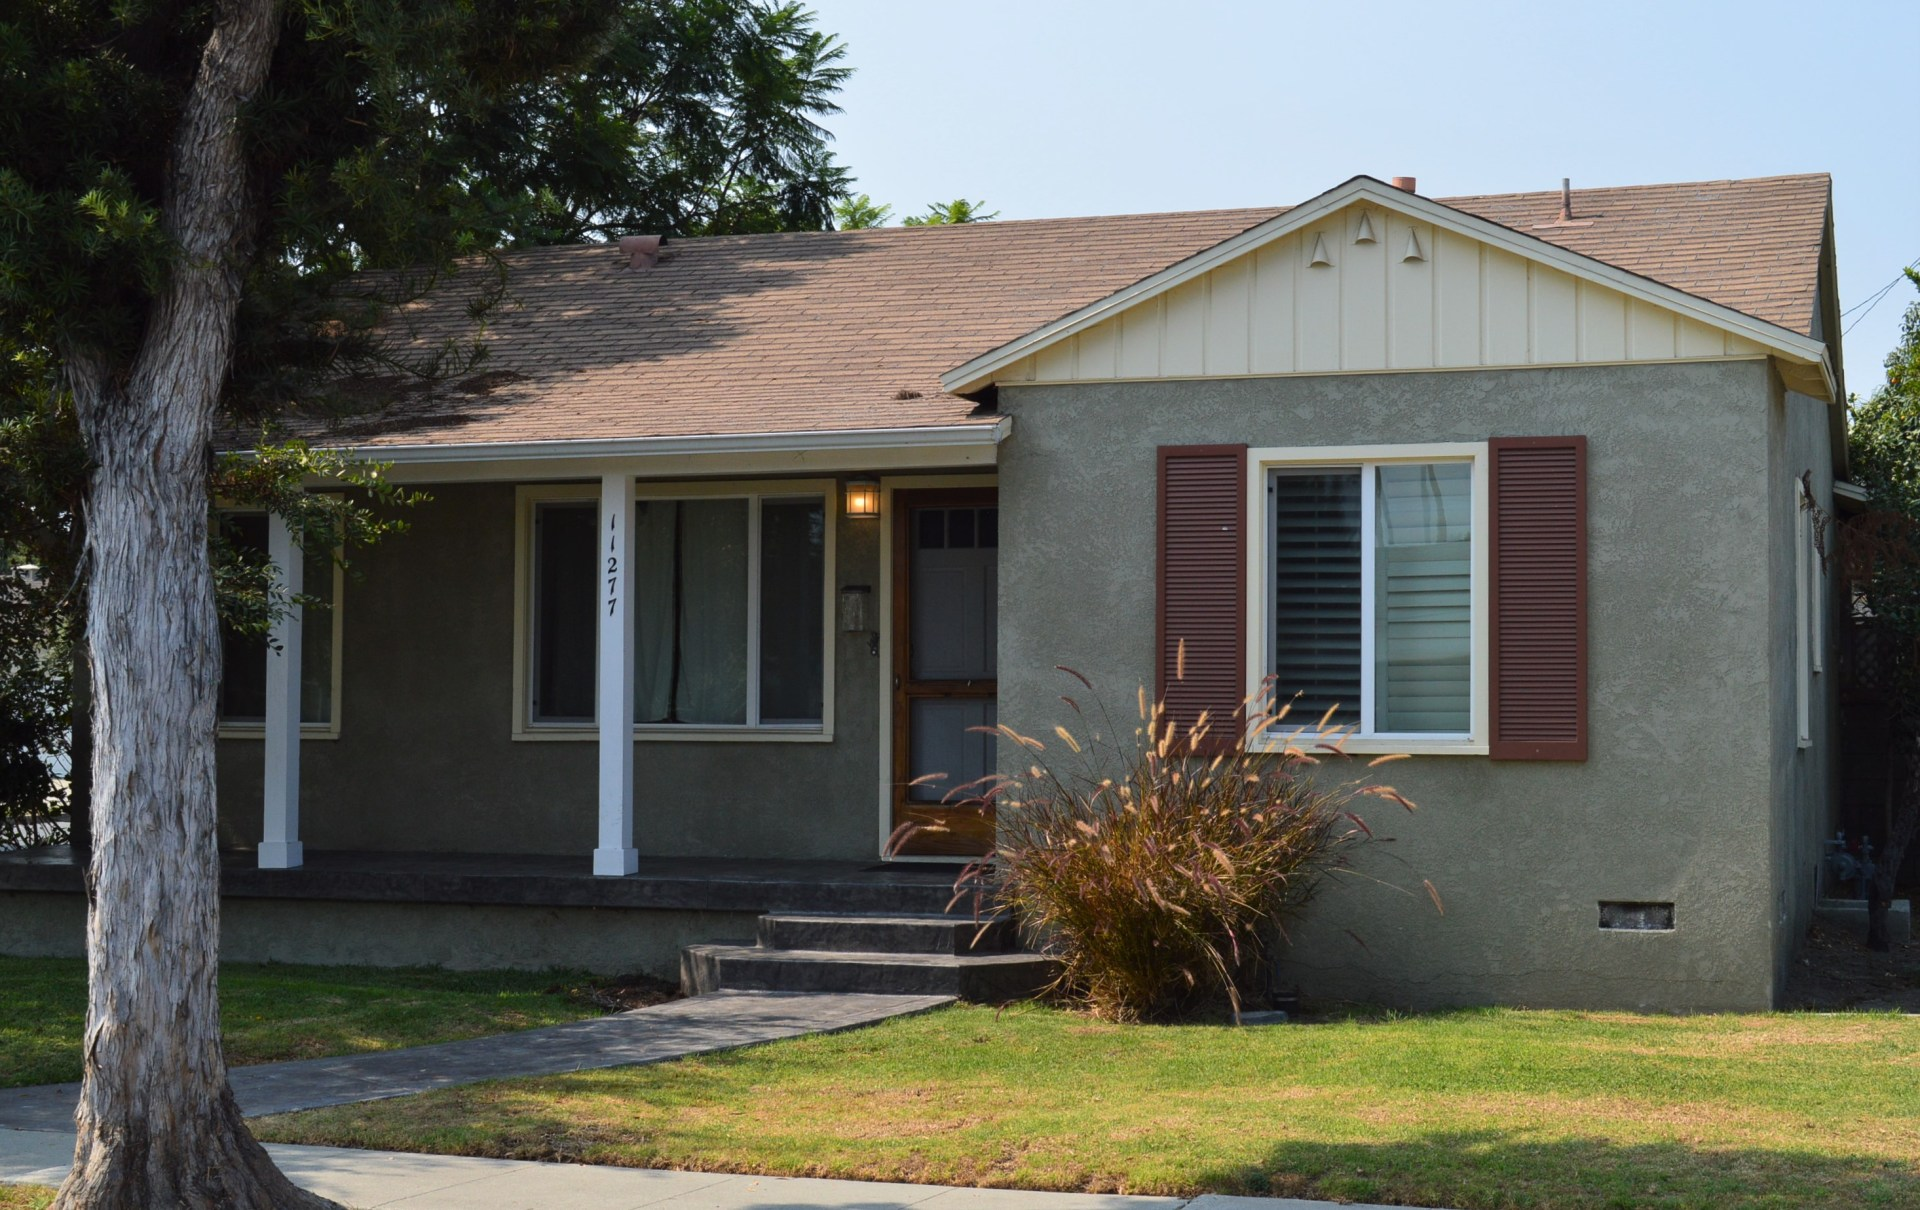 11277 Orville St., Culver City, CA 90230